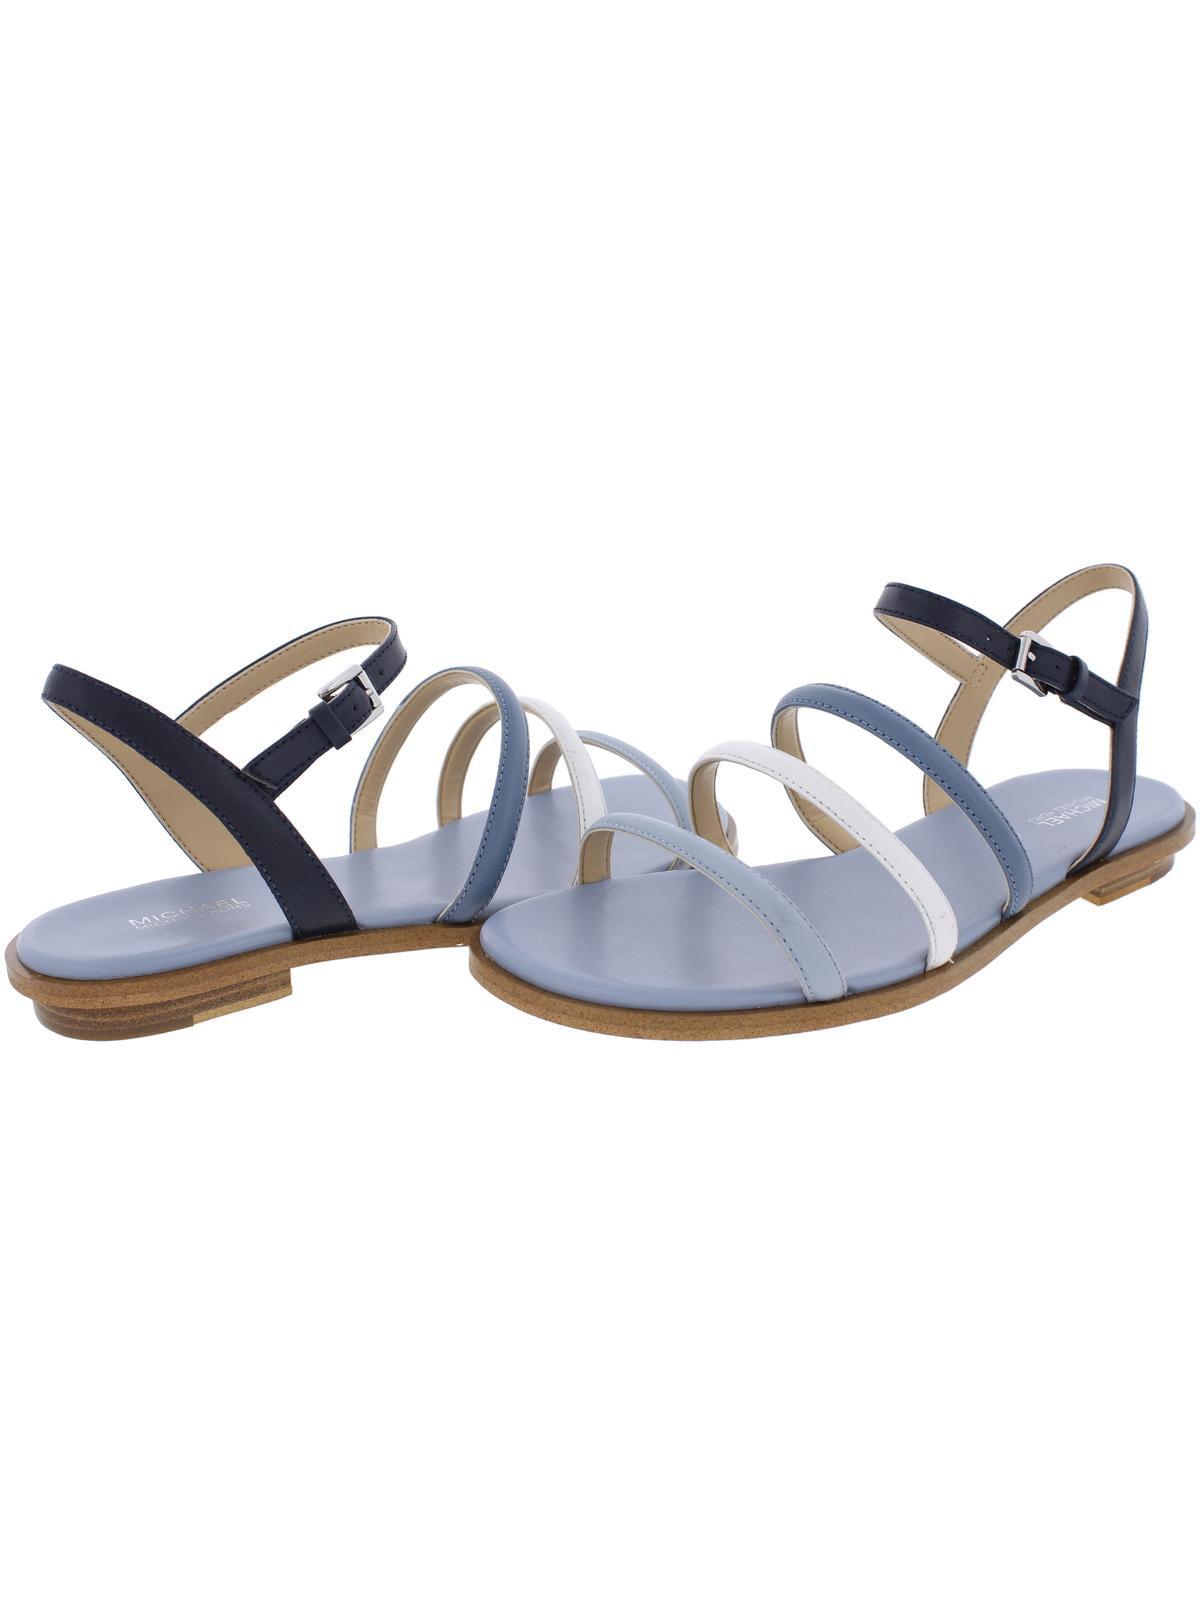 5d3fb7aa4e MICHAEL Michael Kors - MICHAEL Michael Kors Womens Nantucket Leather Open  Toe Flat Sandals - Walmart.com